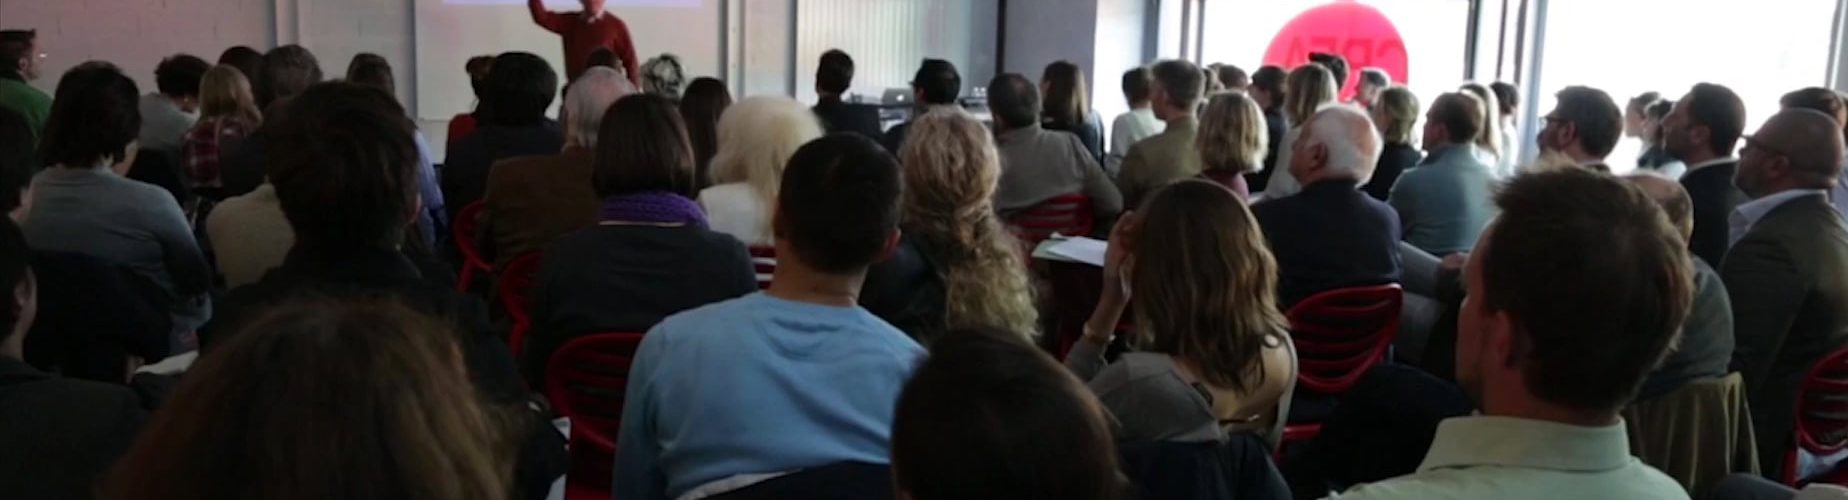 jeff-cabili-conference